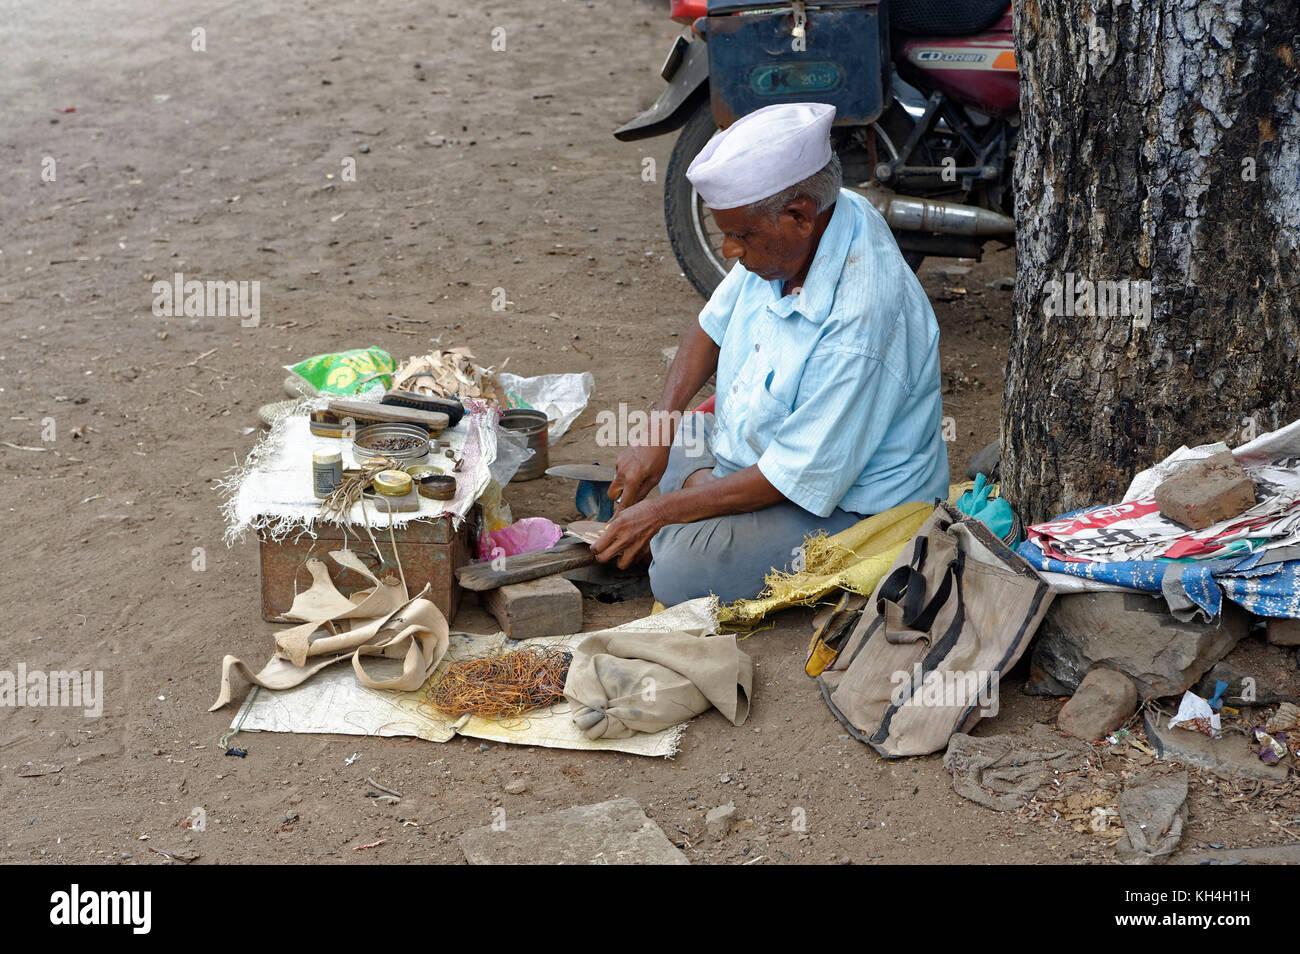 Schuhmacher, miraj, Maharashtra, Indien, Asien Stockbild